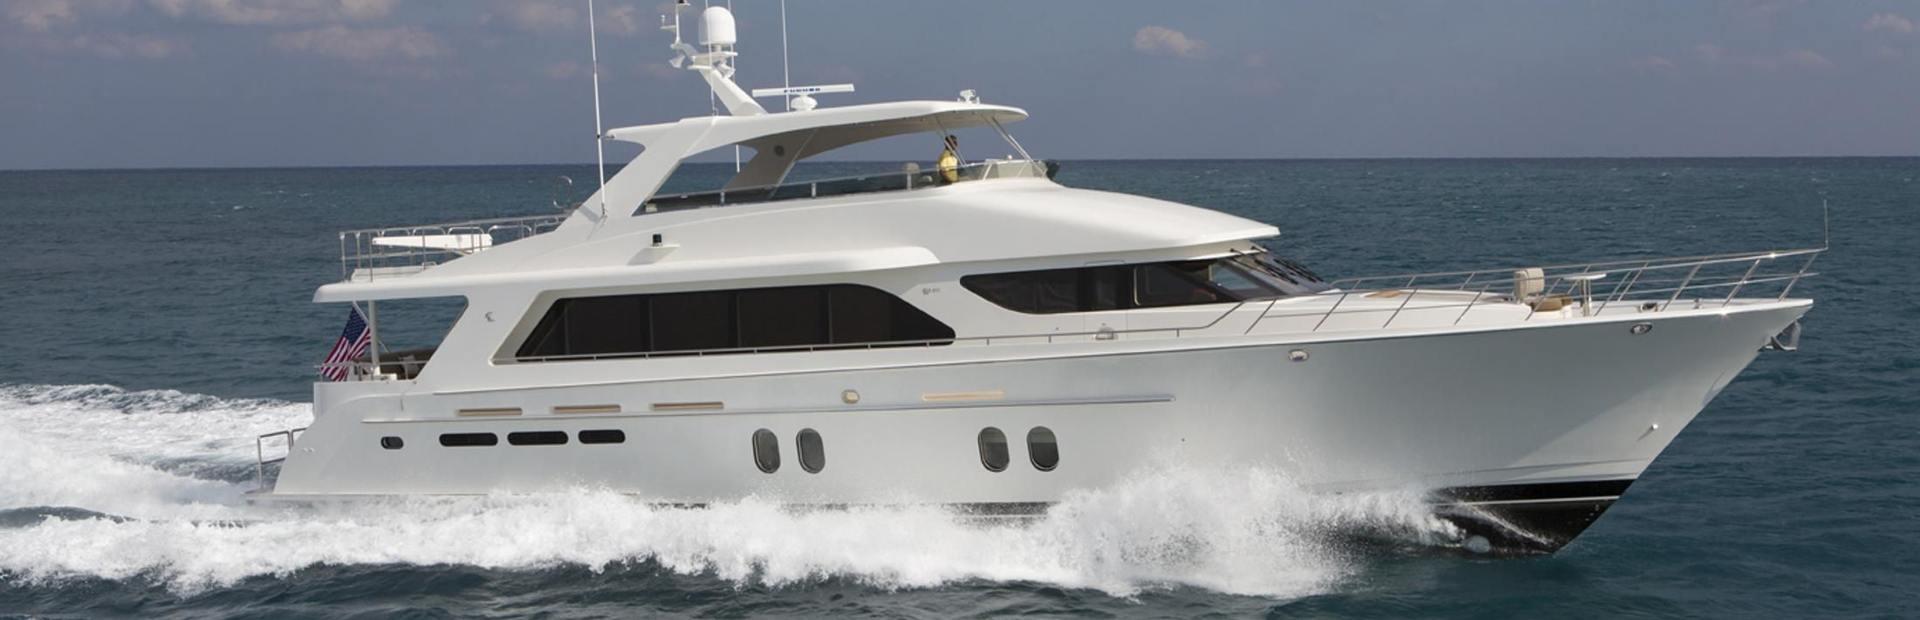 Cheoy Lee Bravo 88 Yacht Charter